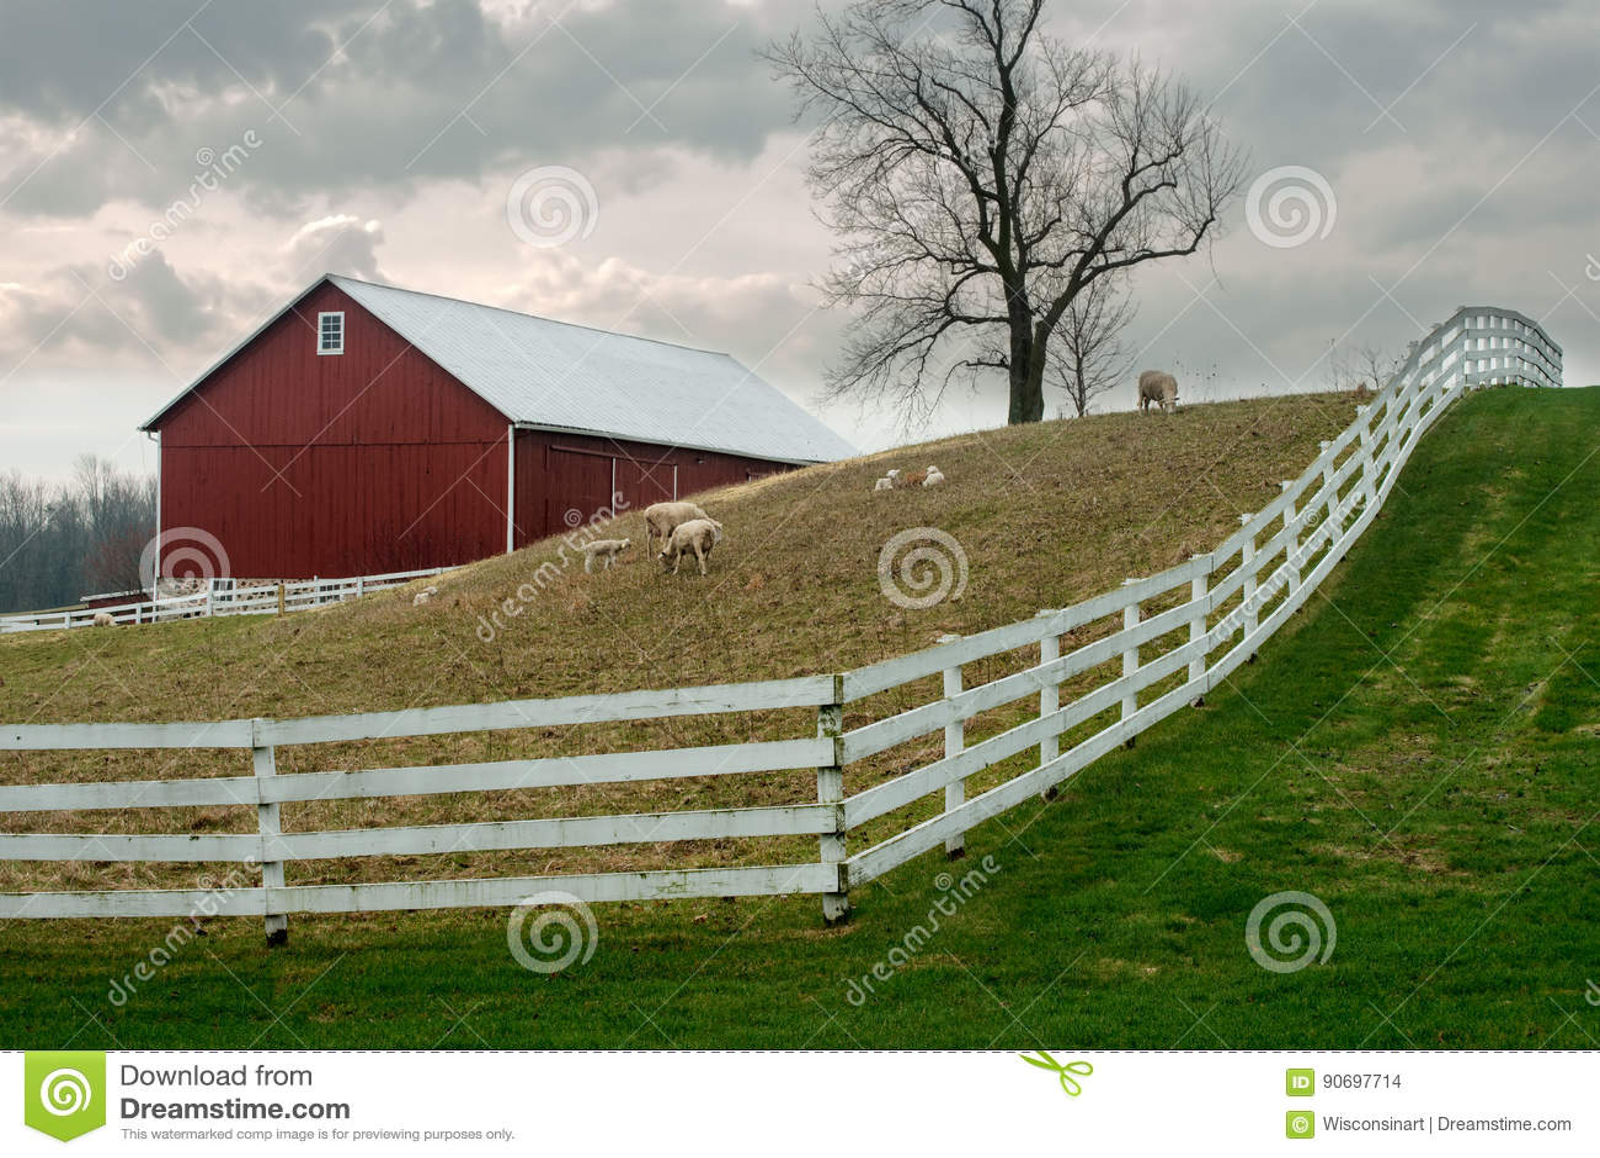 Old Wisconsin Dairy Farm, Sheep